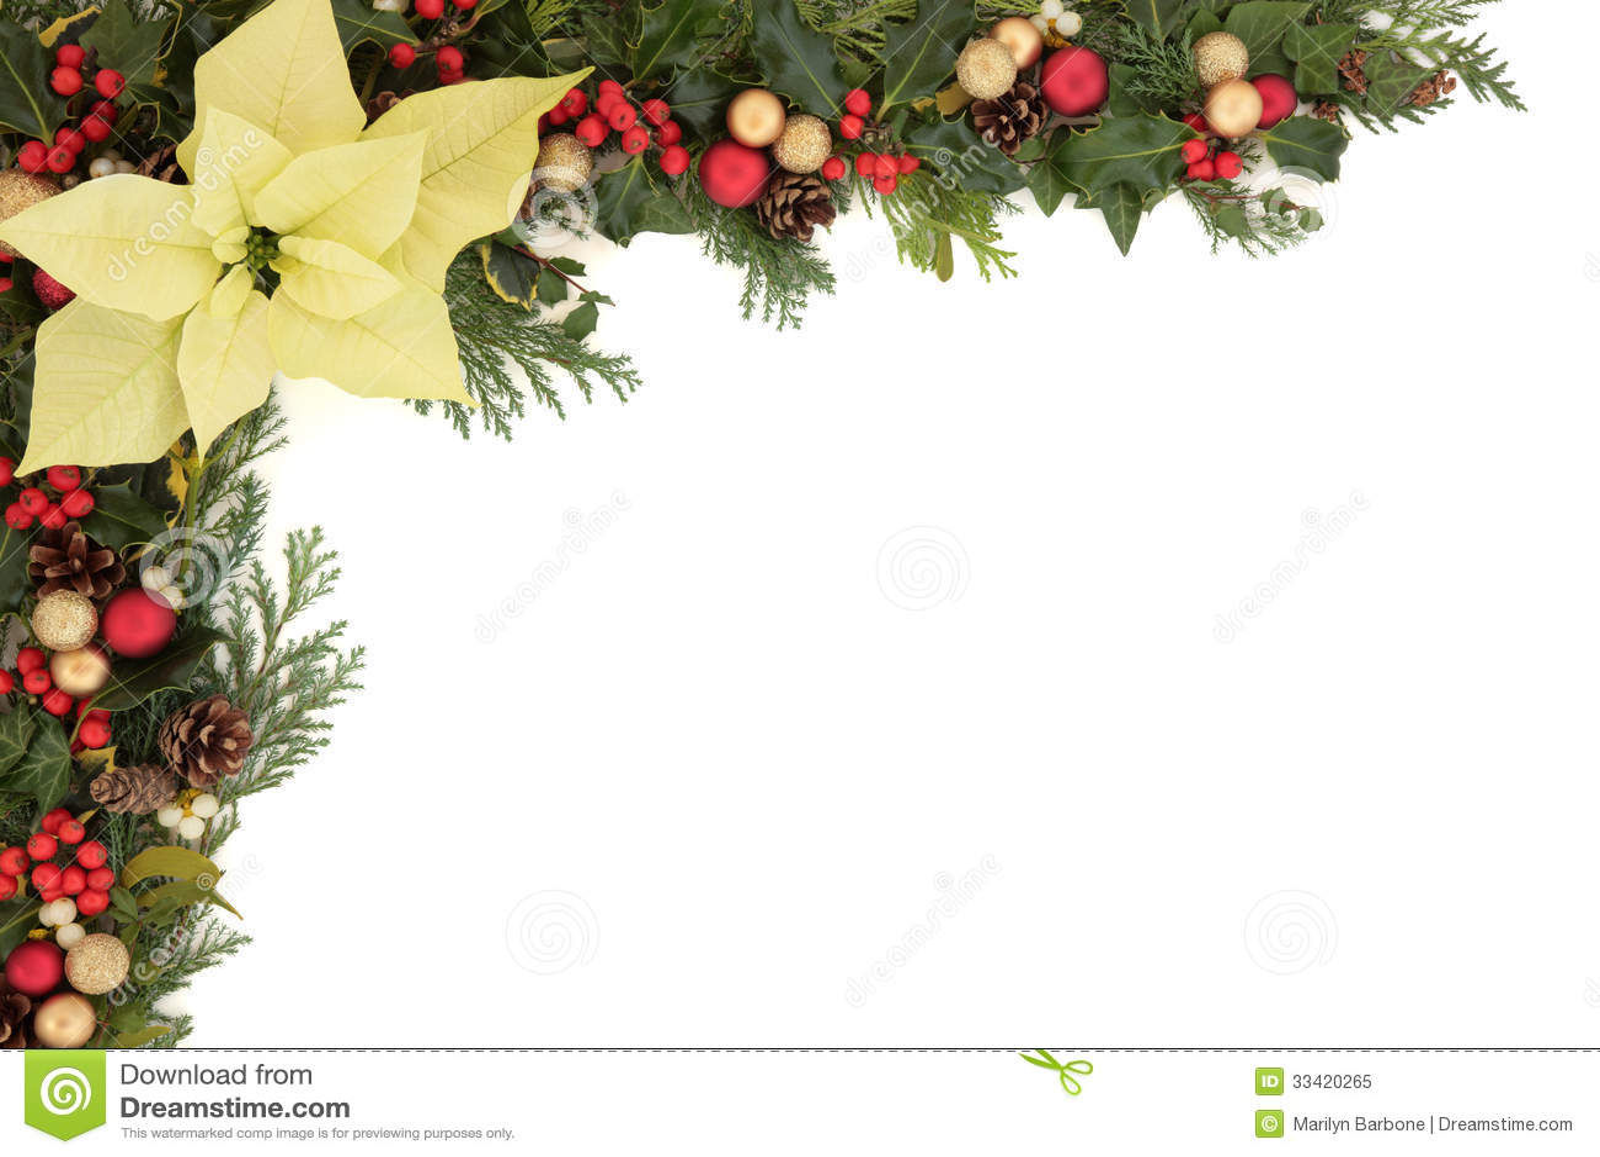 Christmas floral border stock photos freeimages com - Poinsettia Flower Border Royalty Free Stock Photo